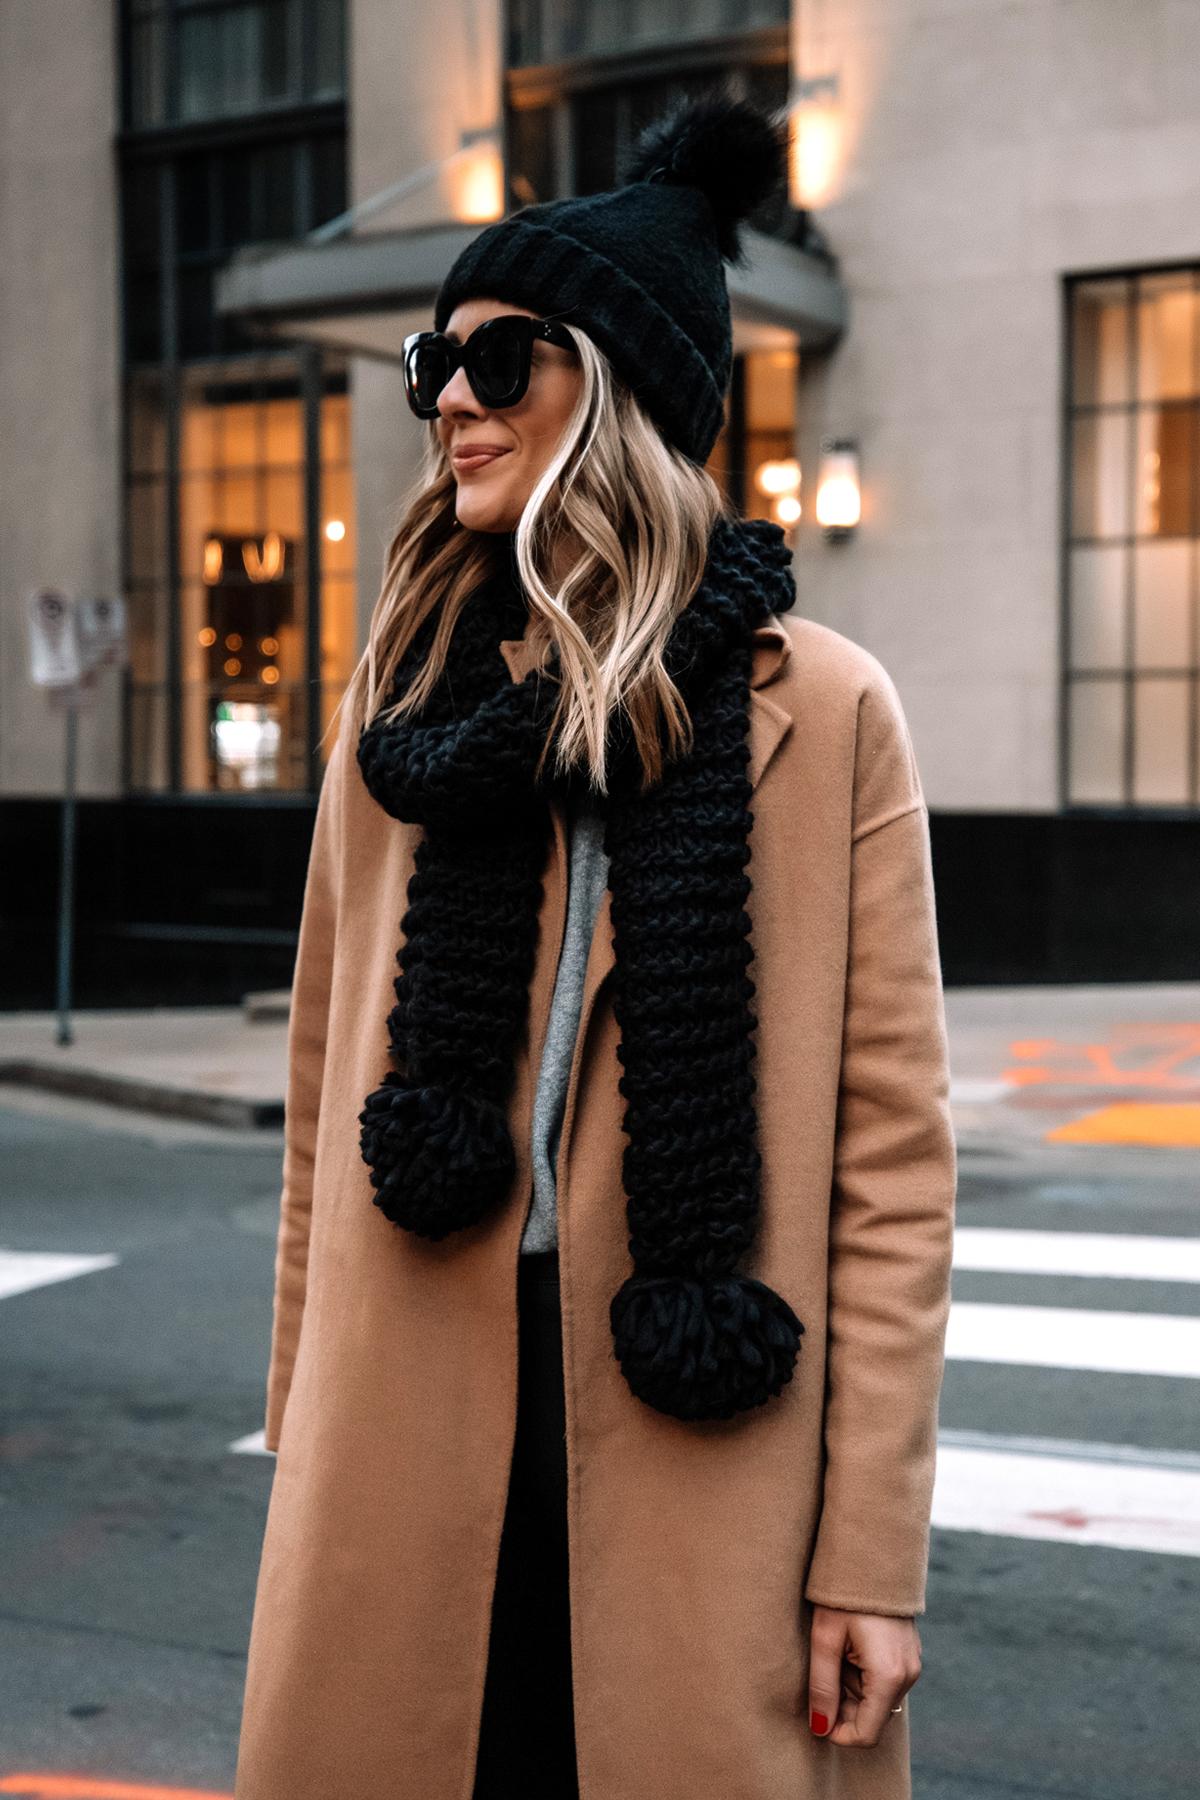 Fashion Jackson Wearing Express Camel Coat Black Scarf Black Beanie Street Style